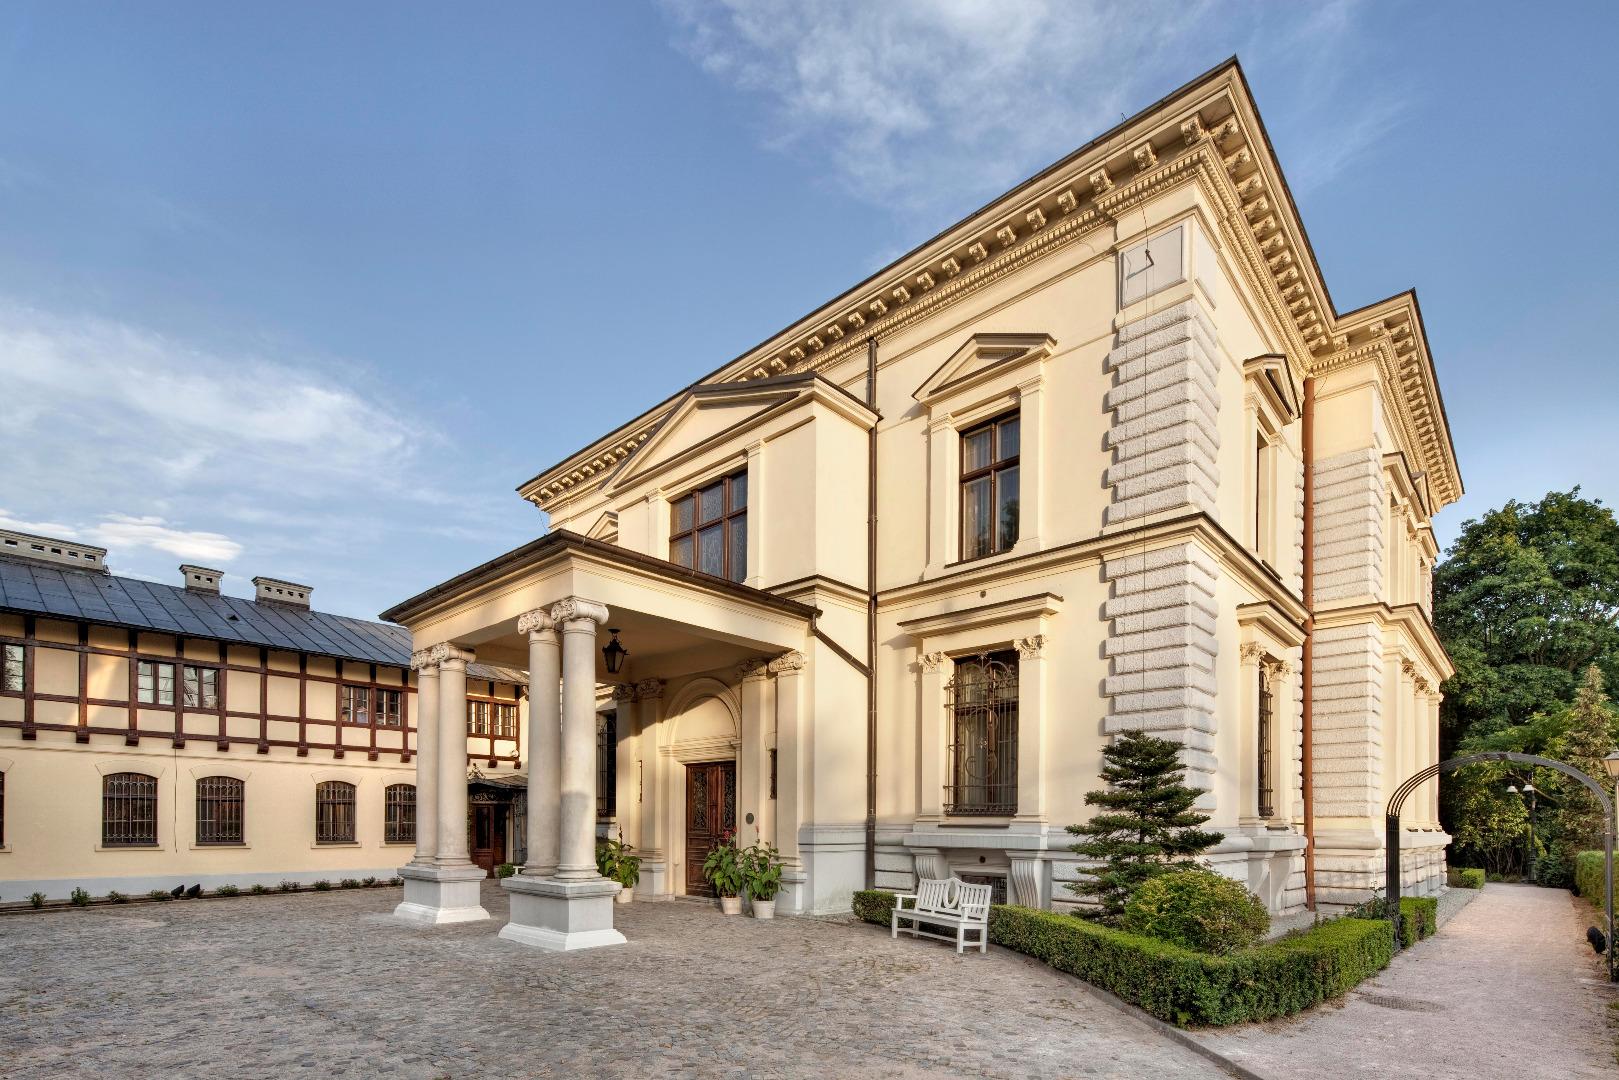 Bydynek Muzeum Pałac Herbsta